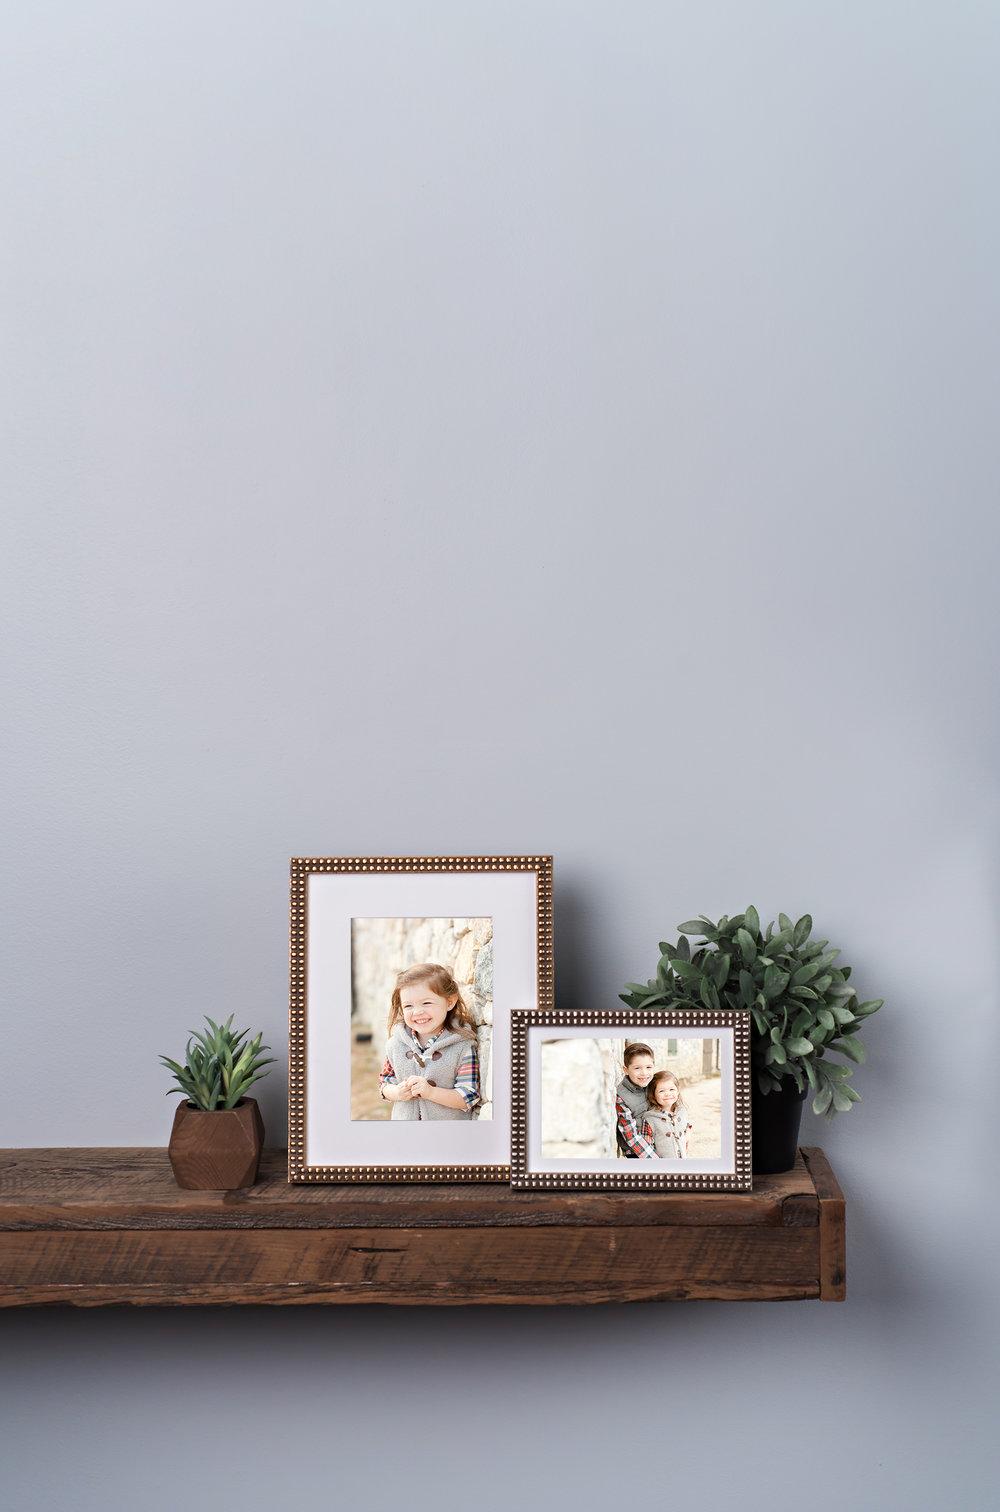 School photos with frame